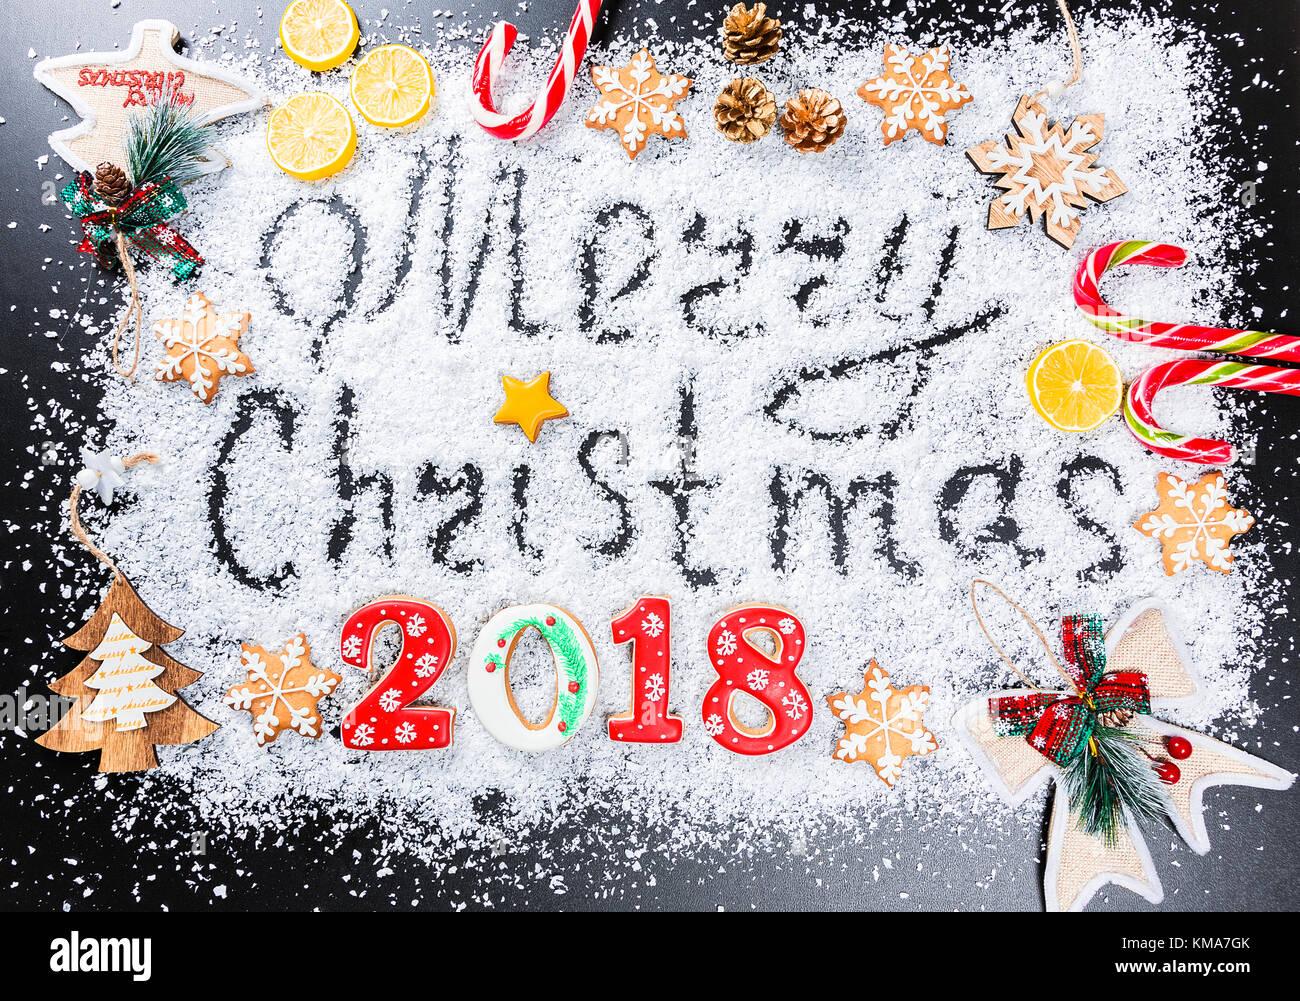 merry christmas 2018 stockfotos merry christmas 2018. Black Bedroom Furniture Sets. Home Design Ideas